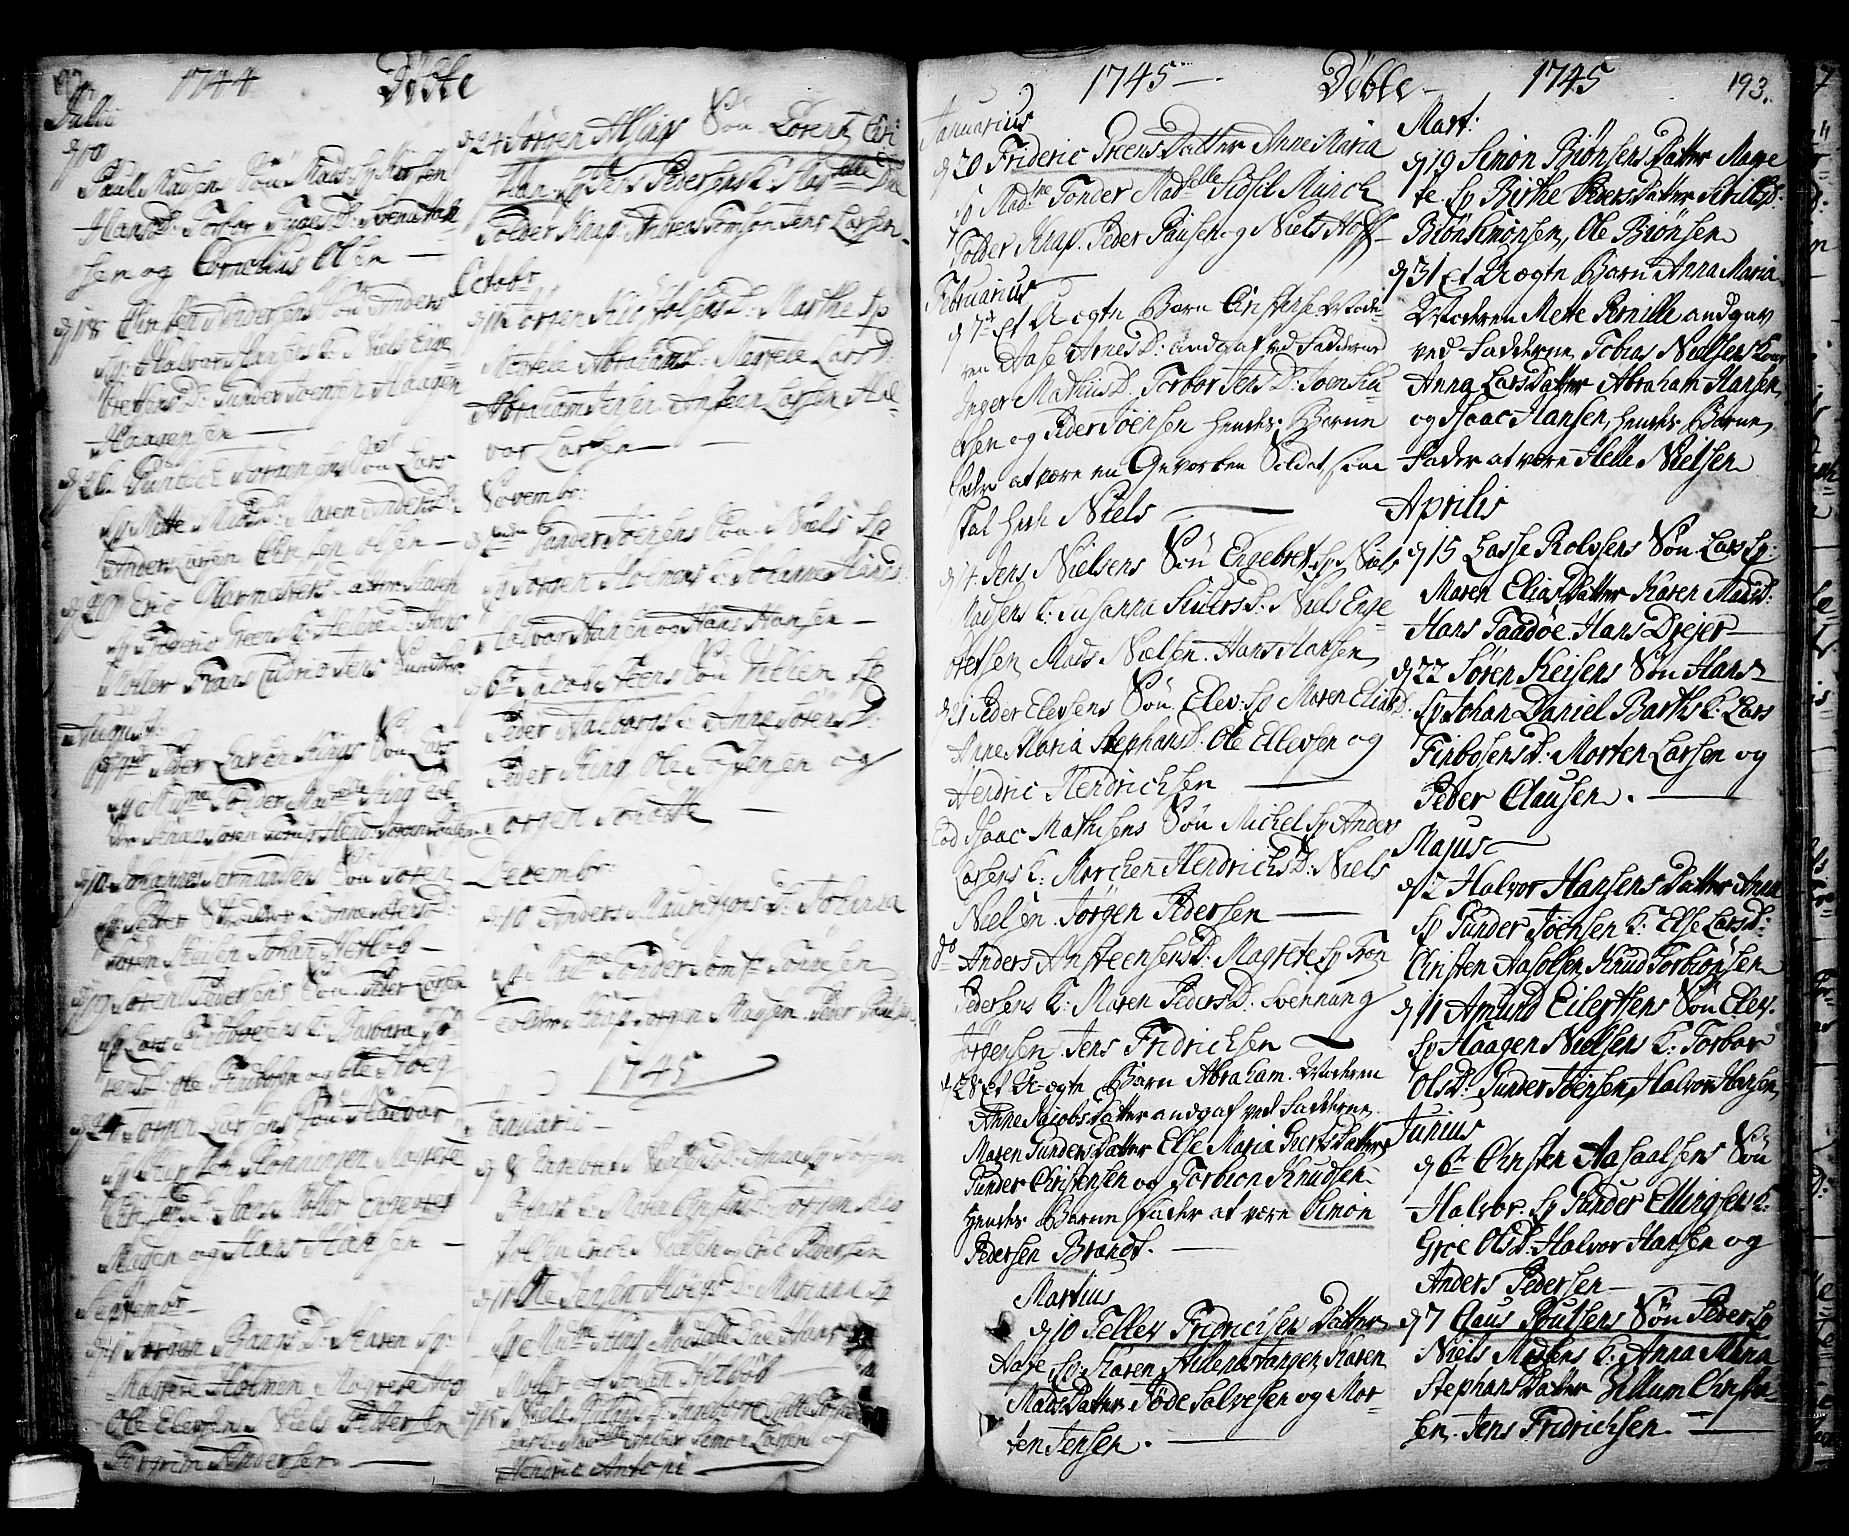 SAKO, Kragerø kirkebøker, F/Fa/L0001: Ministerialbok nr. 1, 1702-1766, s. 192-193